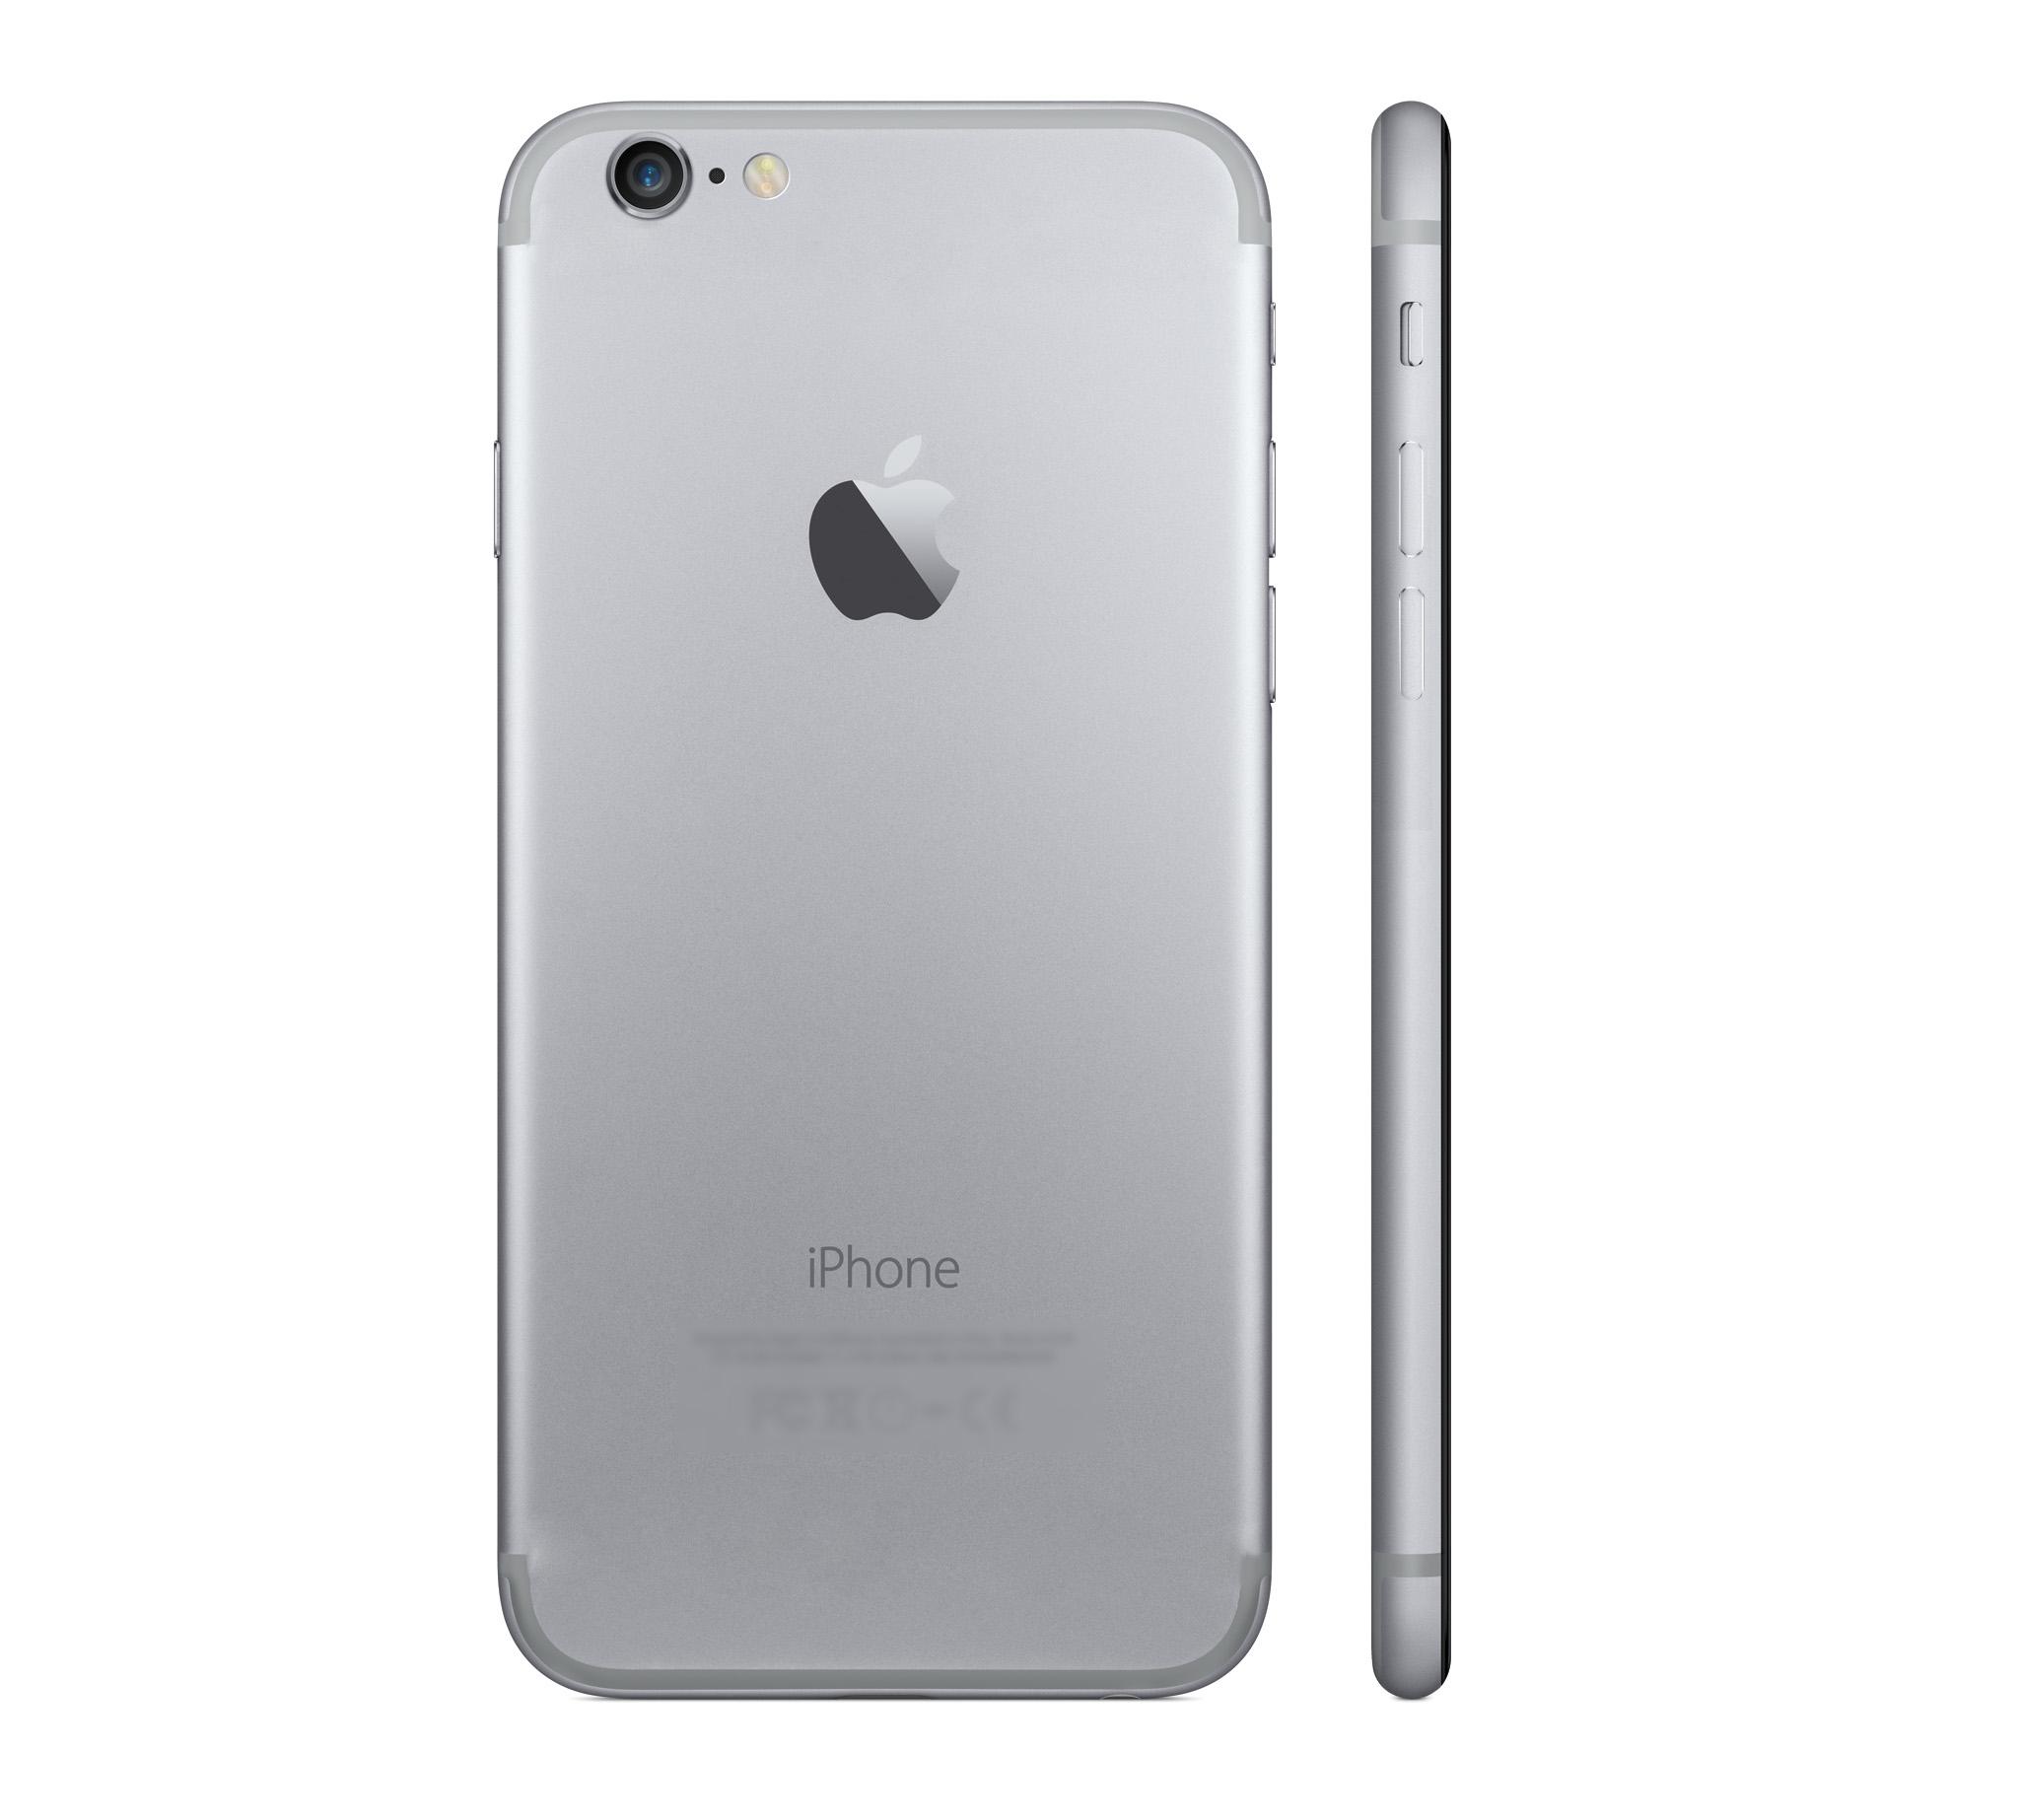 iphone-7-tinhte-1.jpg